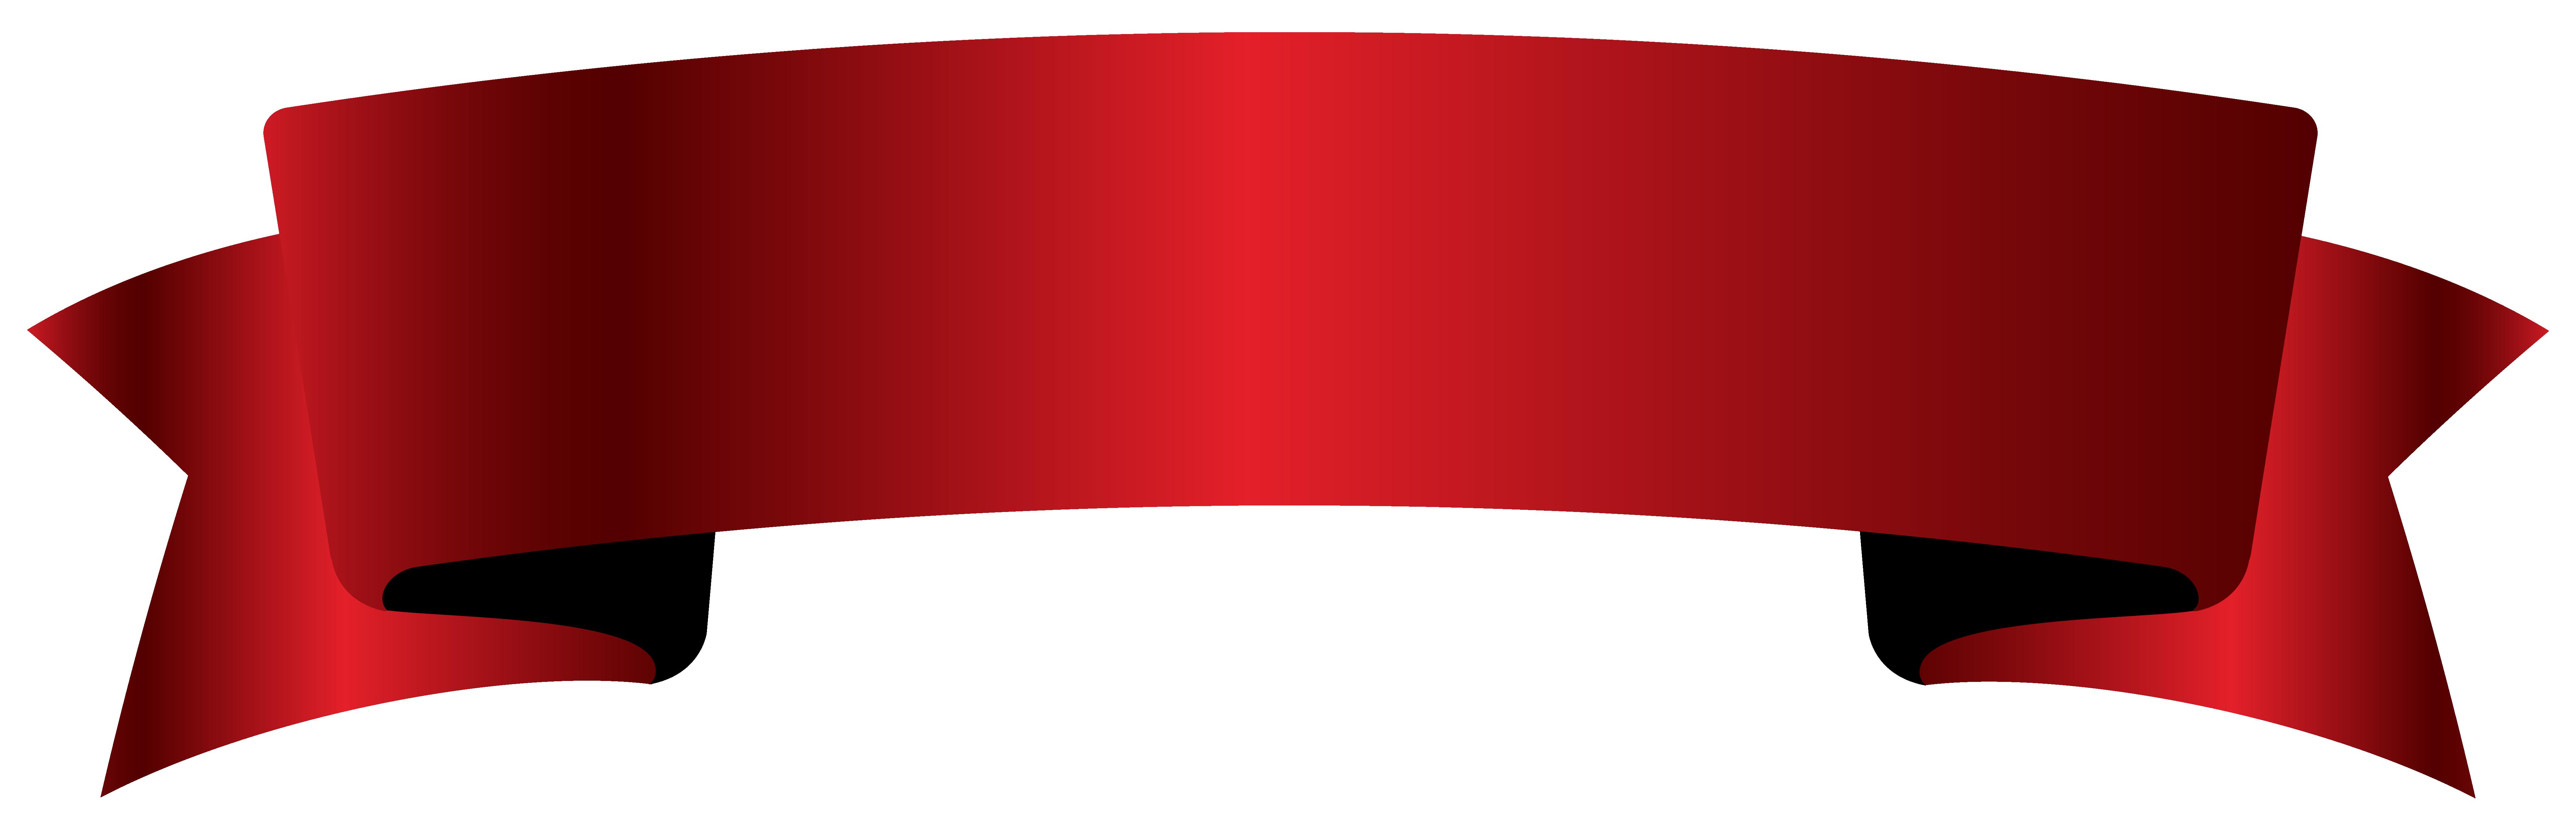 Clipart Banner - clipartall .